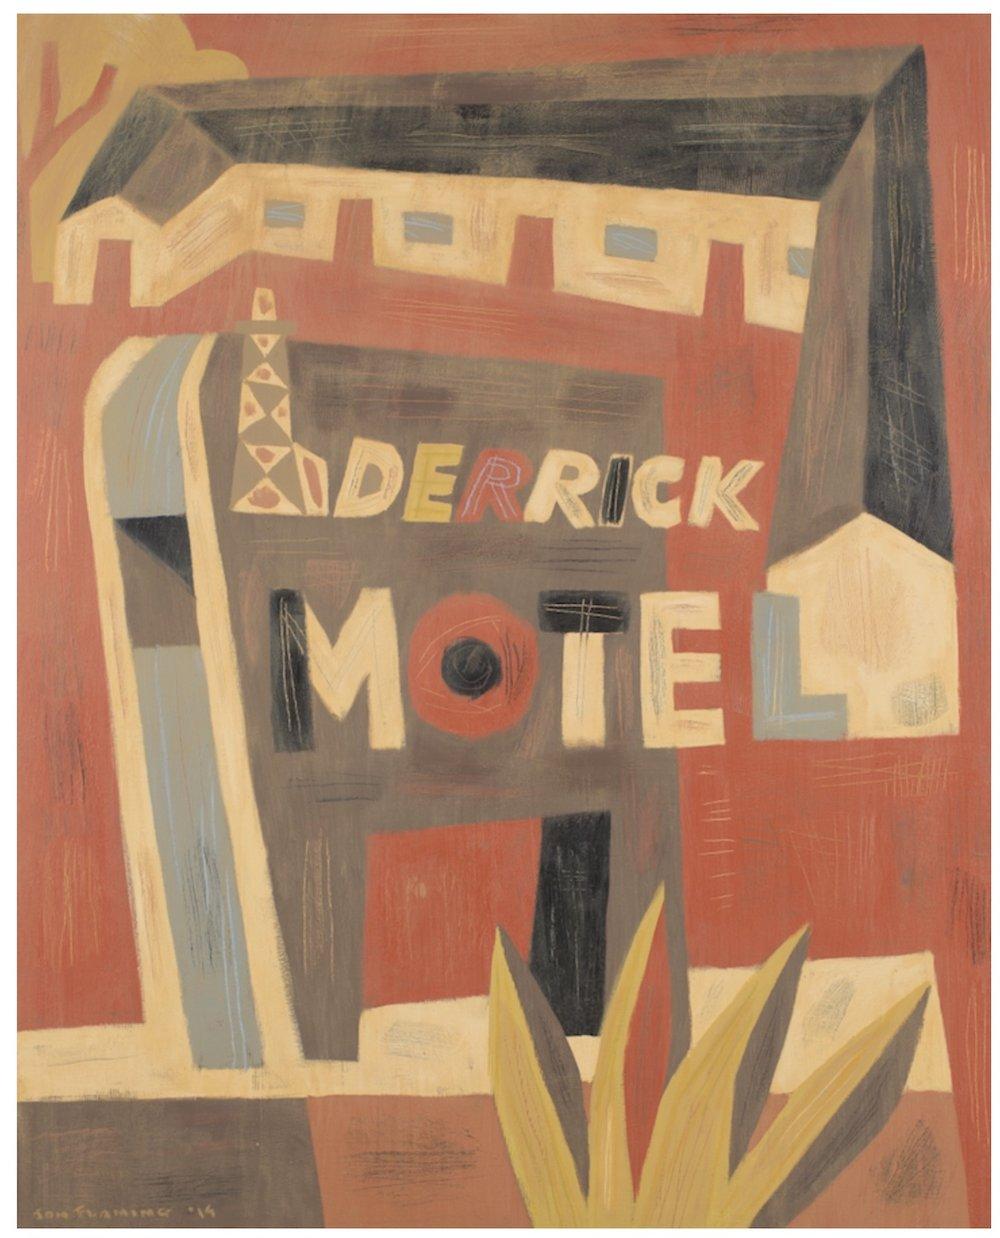 Derrick Motel (abandoned motel east of Abilene), 60 x 48, oil & acrylic on canvas, 2014